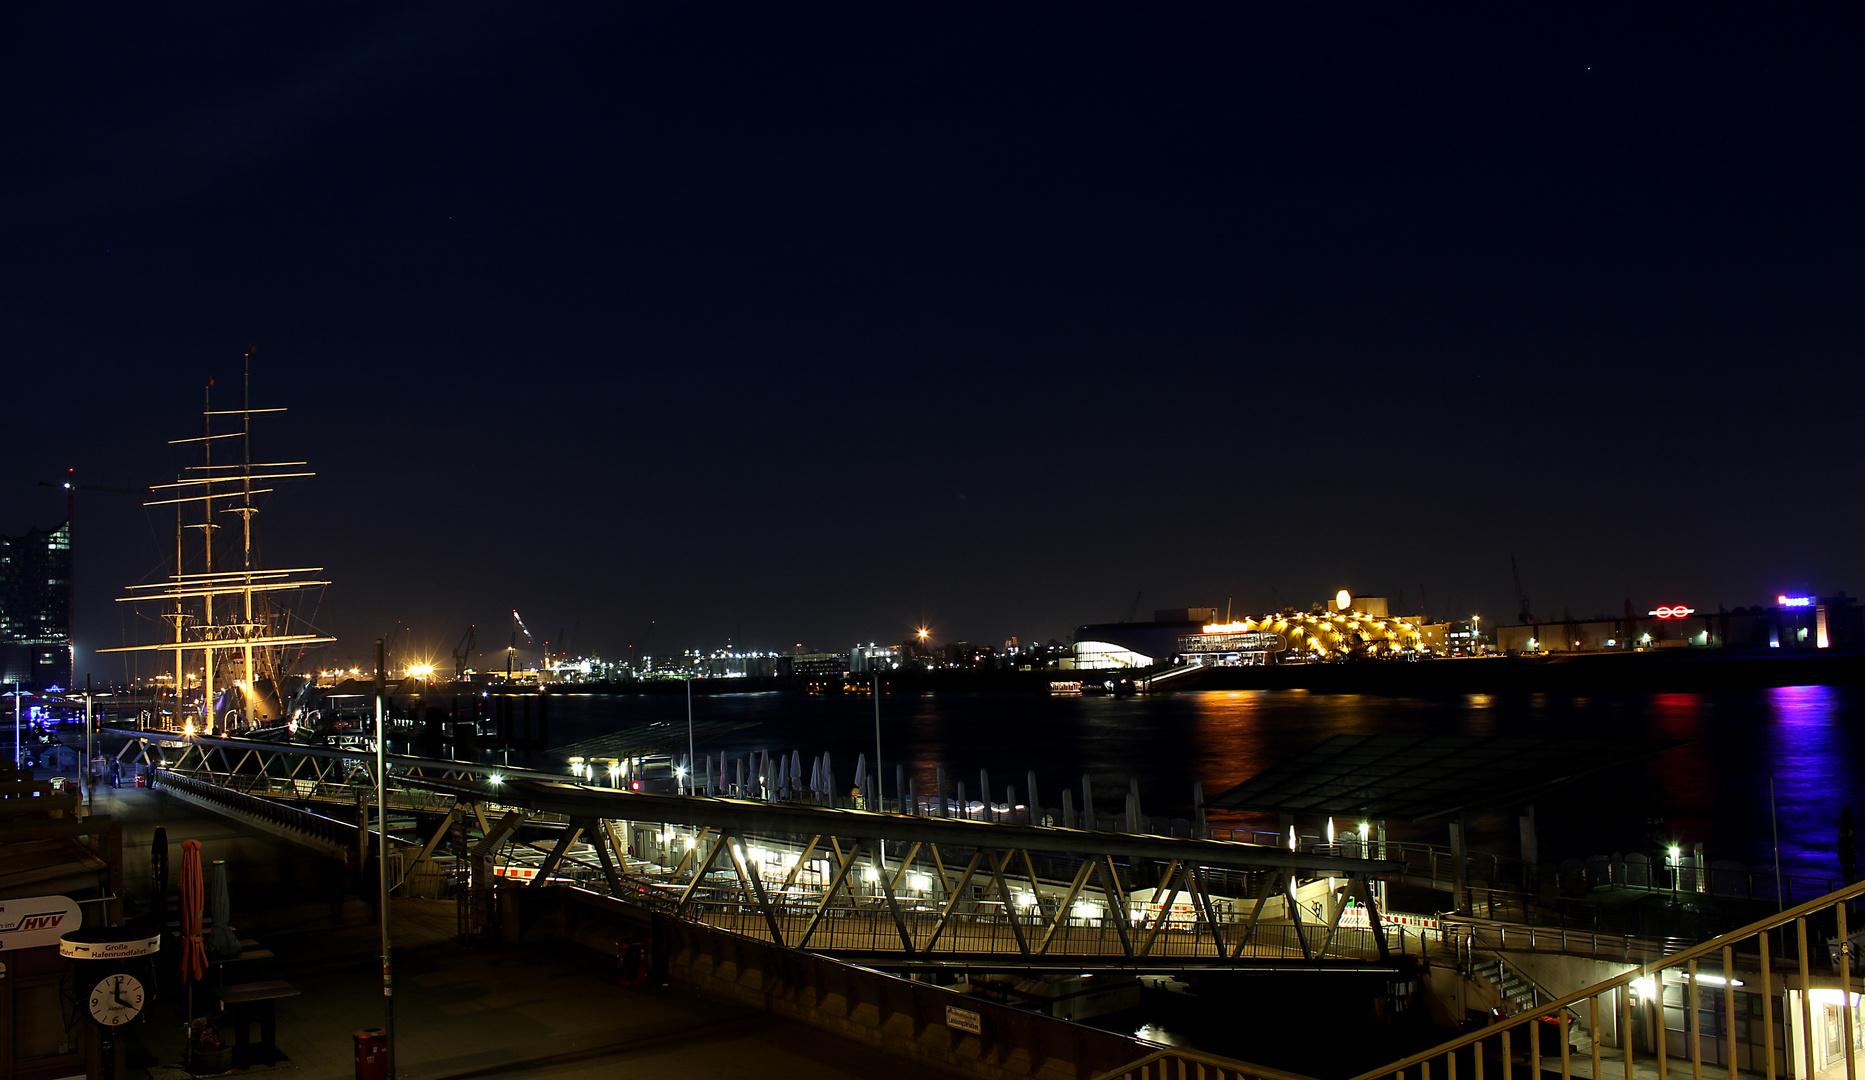 St.Pauli - Landungsbrücken by Nacht